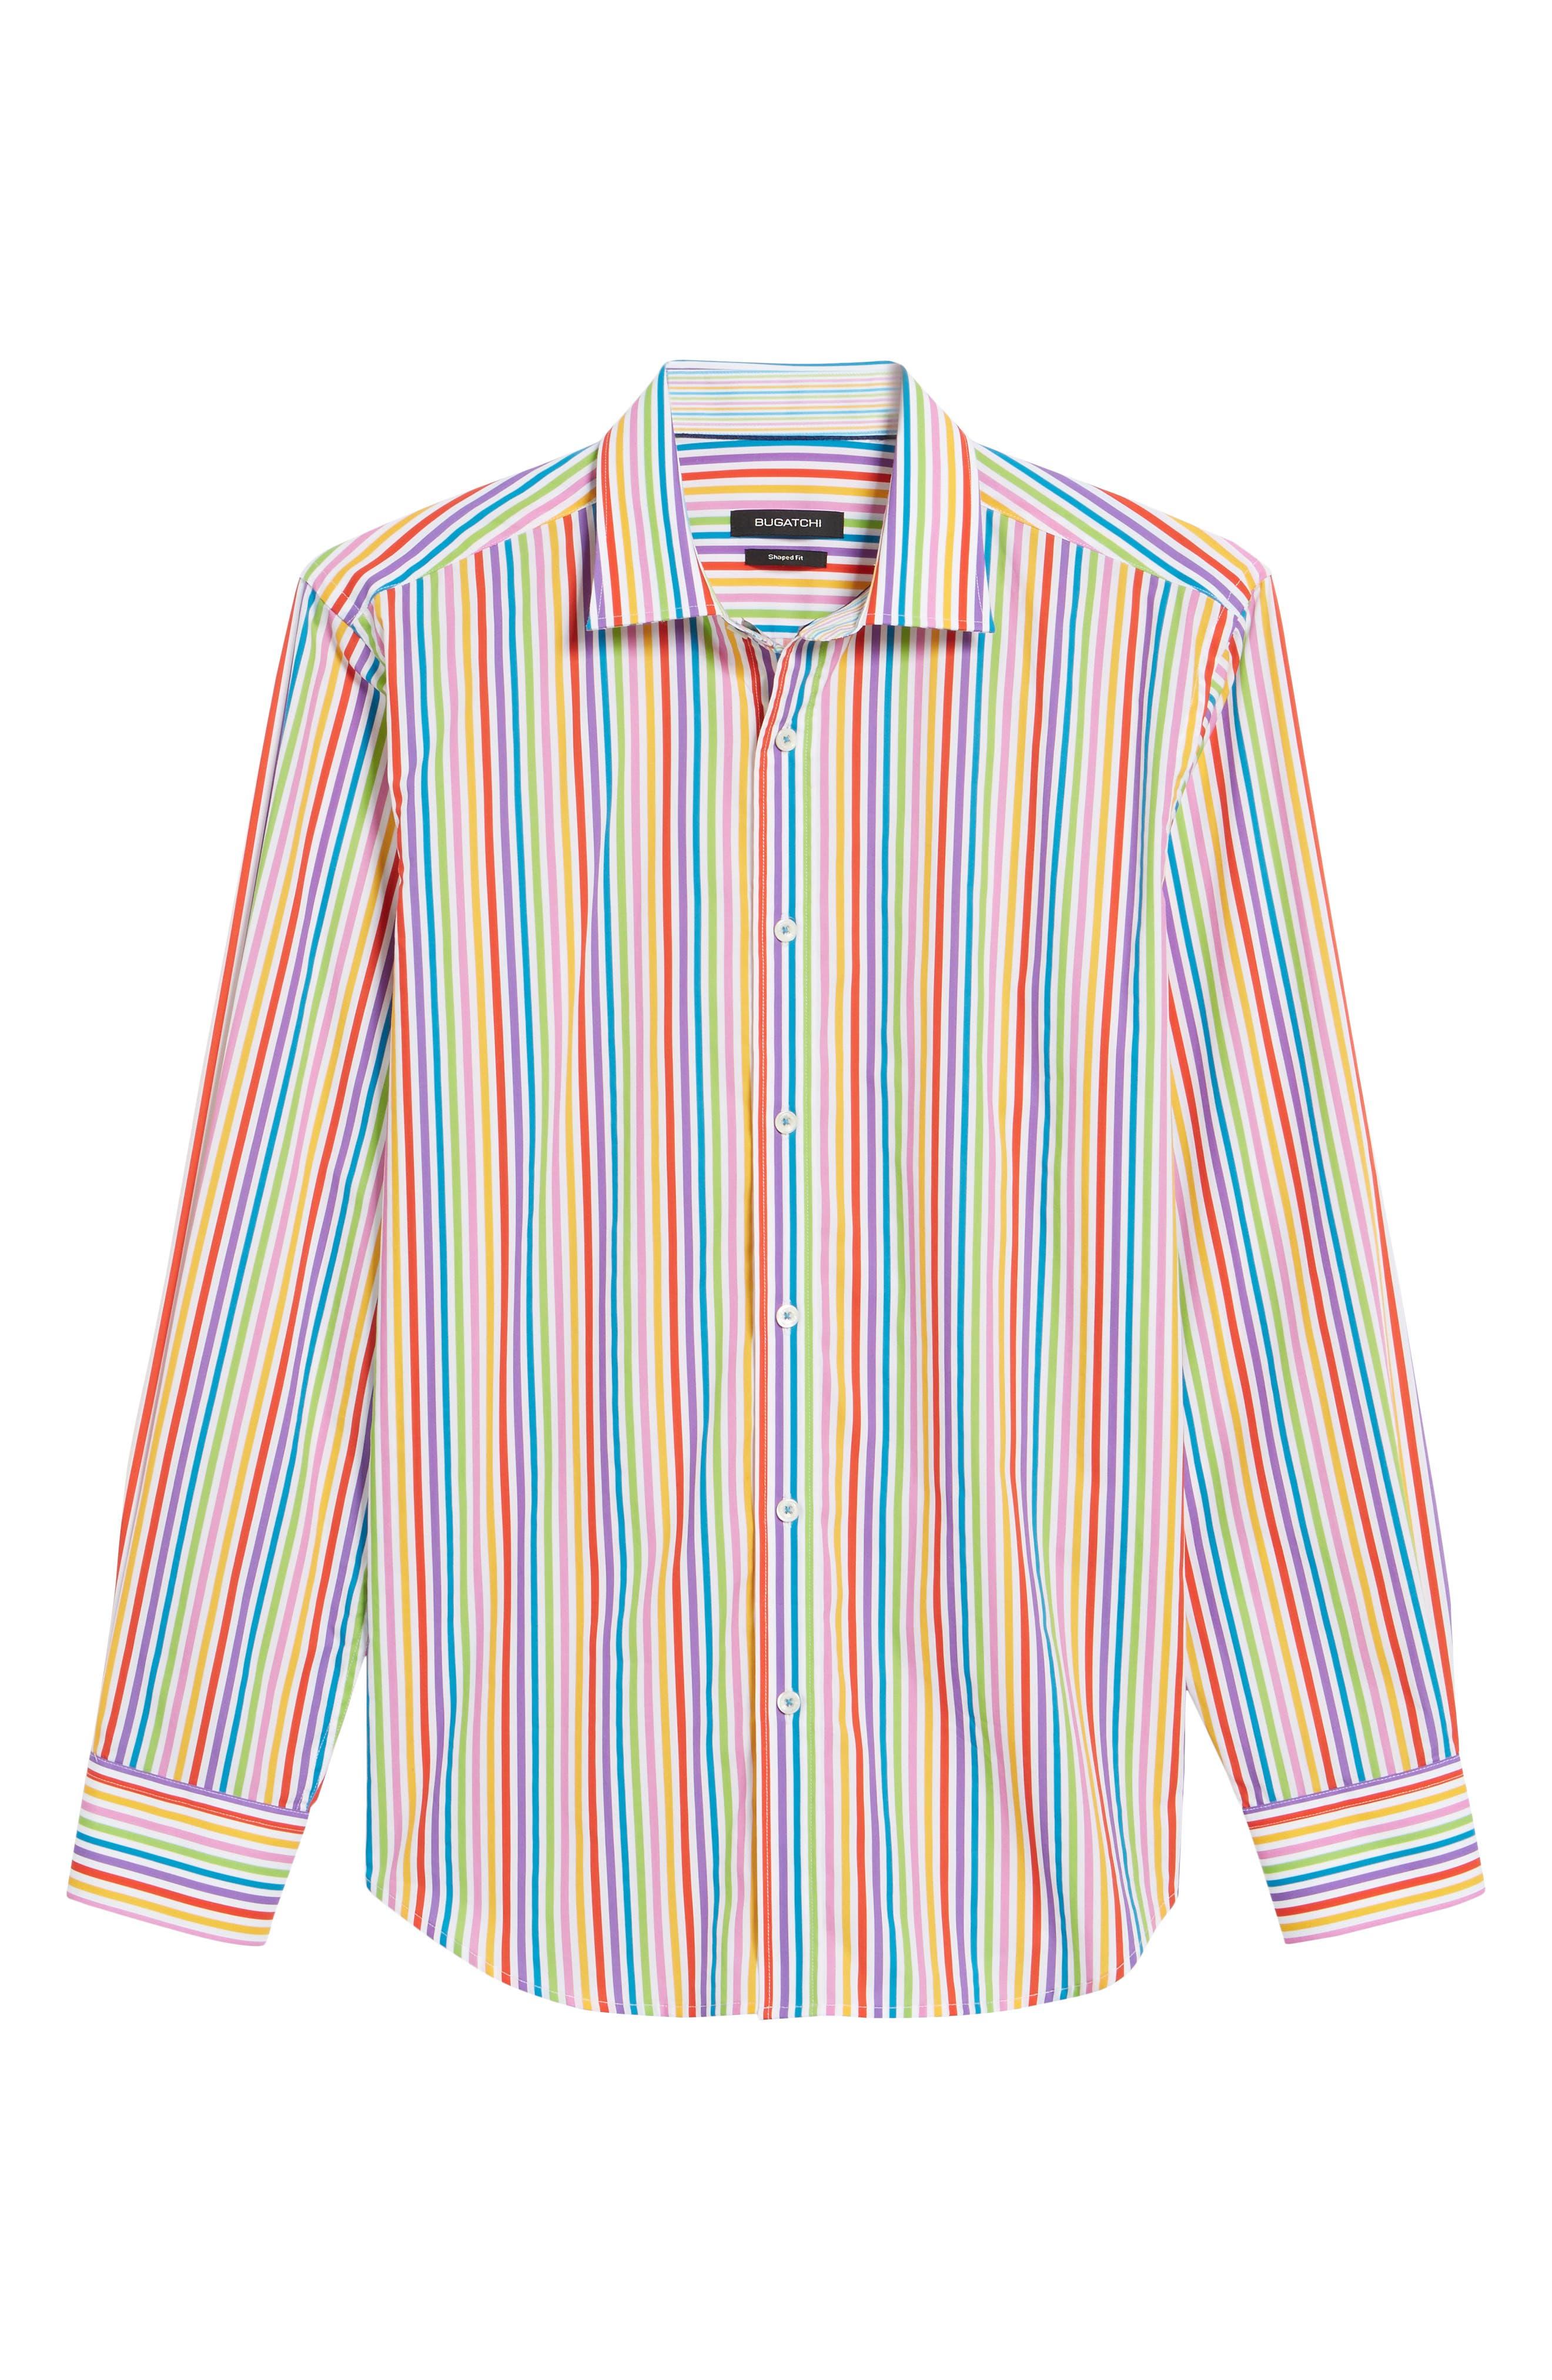 BUGATCHI,                             Classic Fit Woven Sport Shirt,                             Alternate thumbnail 6, color,                             601